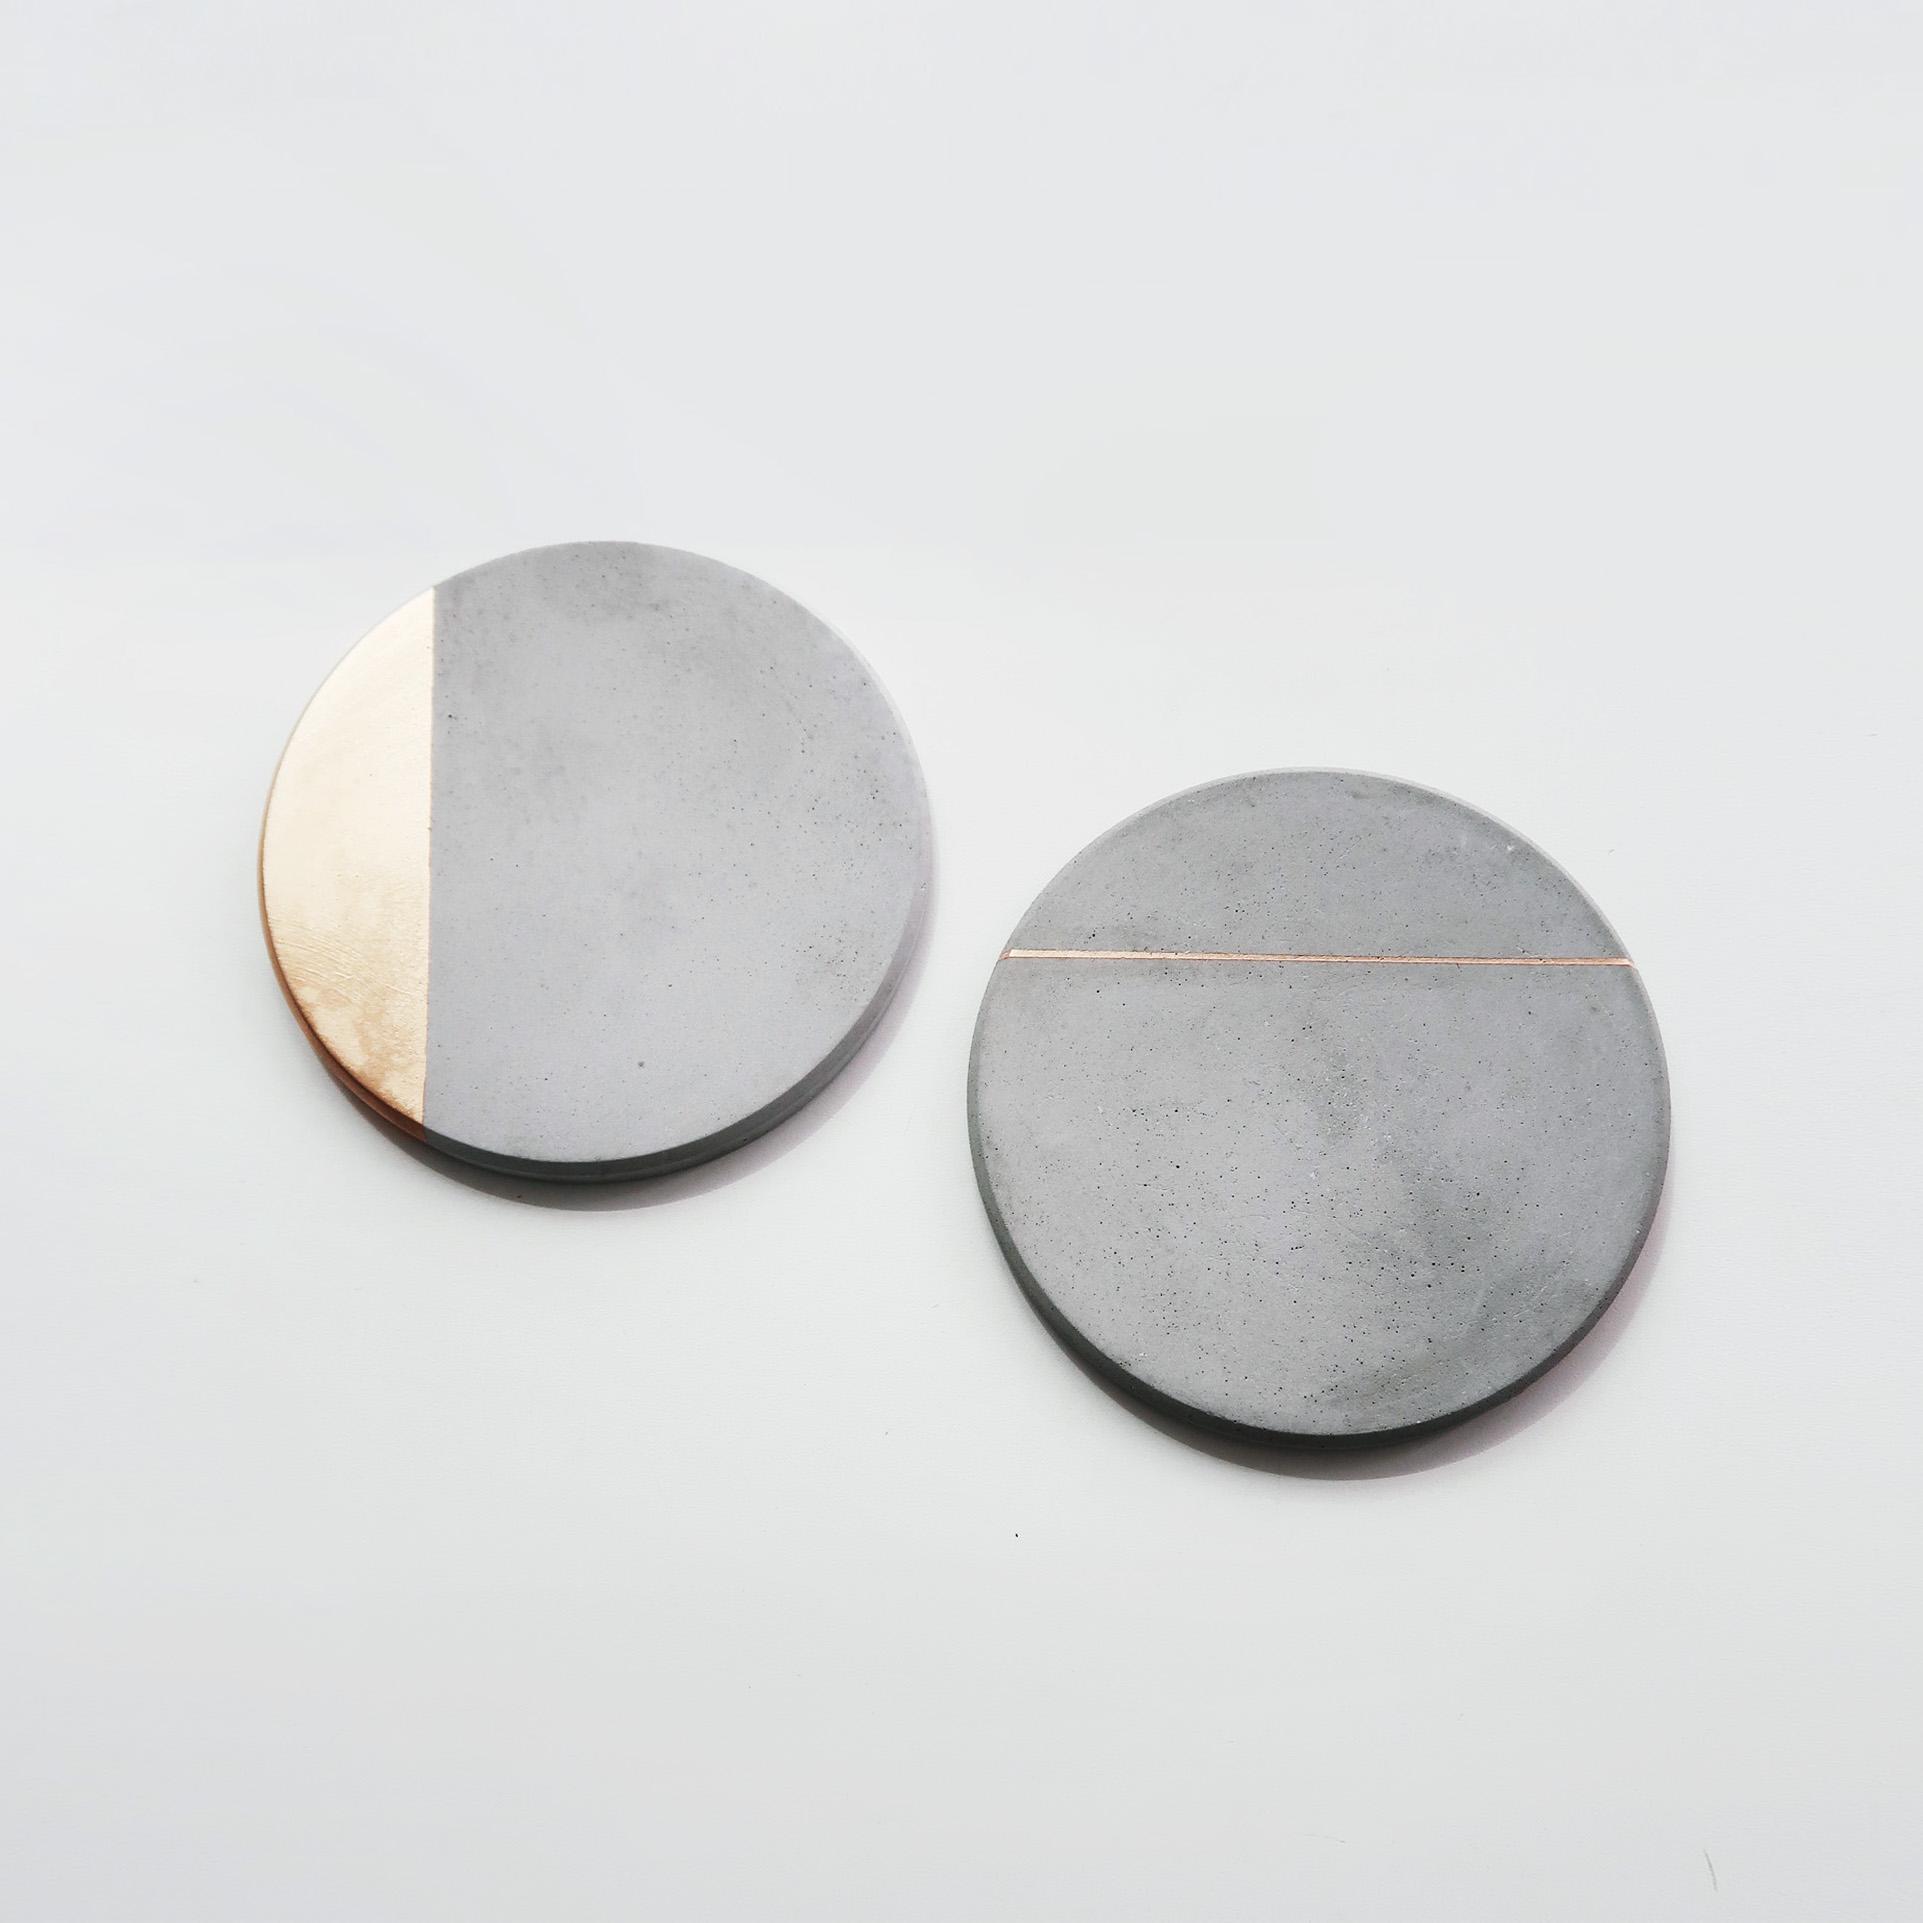 Home Decor 月蝕金邊倒角設計水泥圓墊・飾品陳列・居家佈置